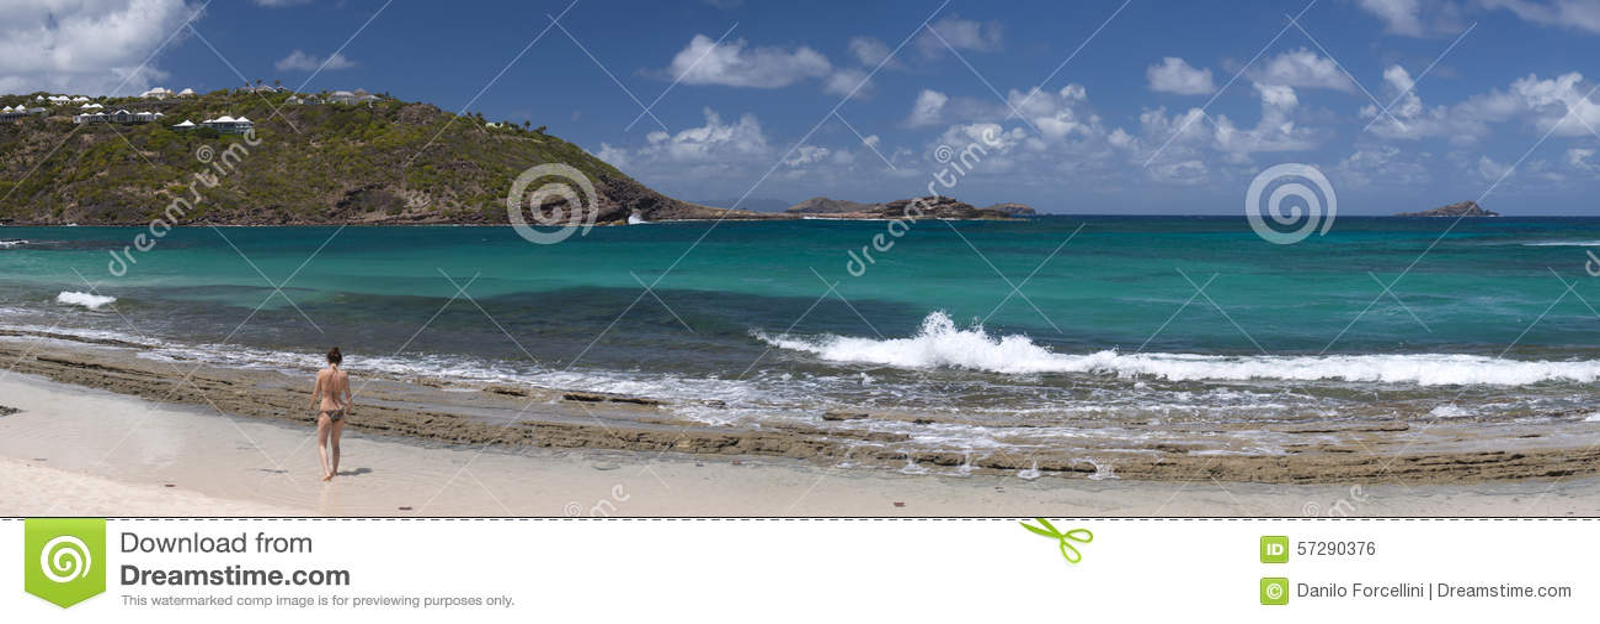 St Barth海岛,加勒比海